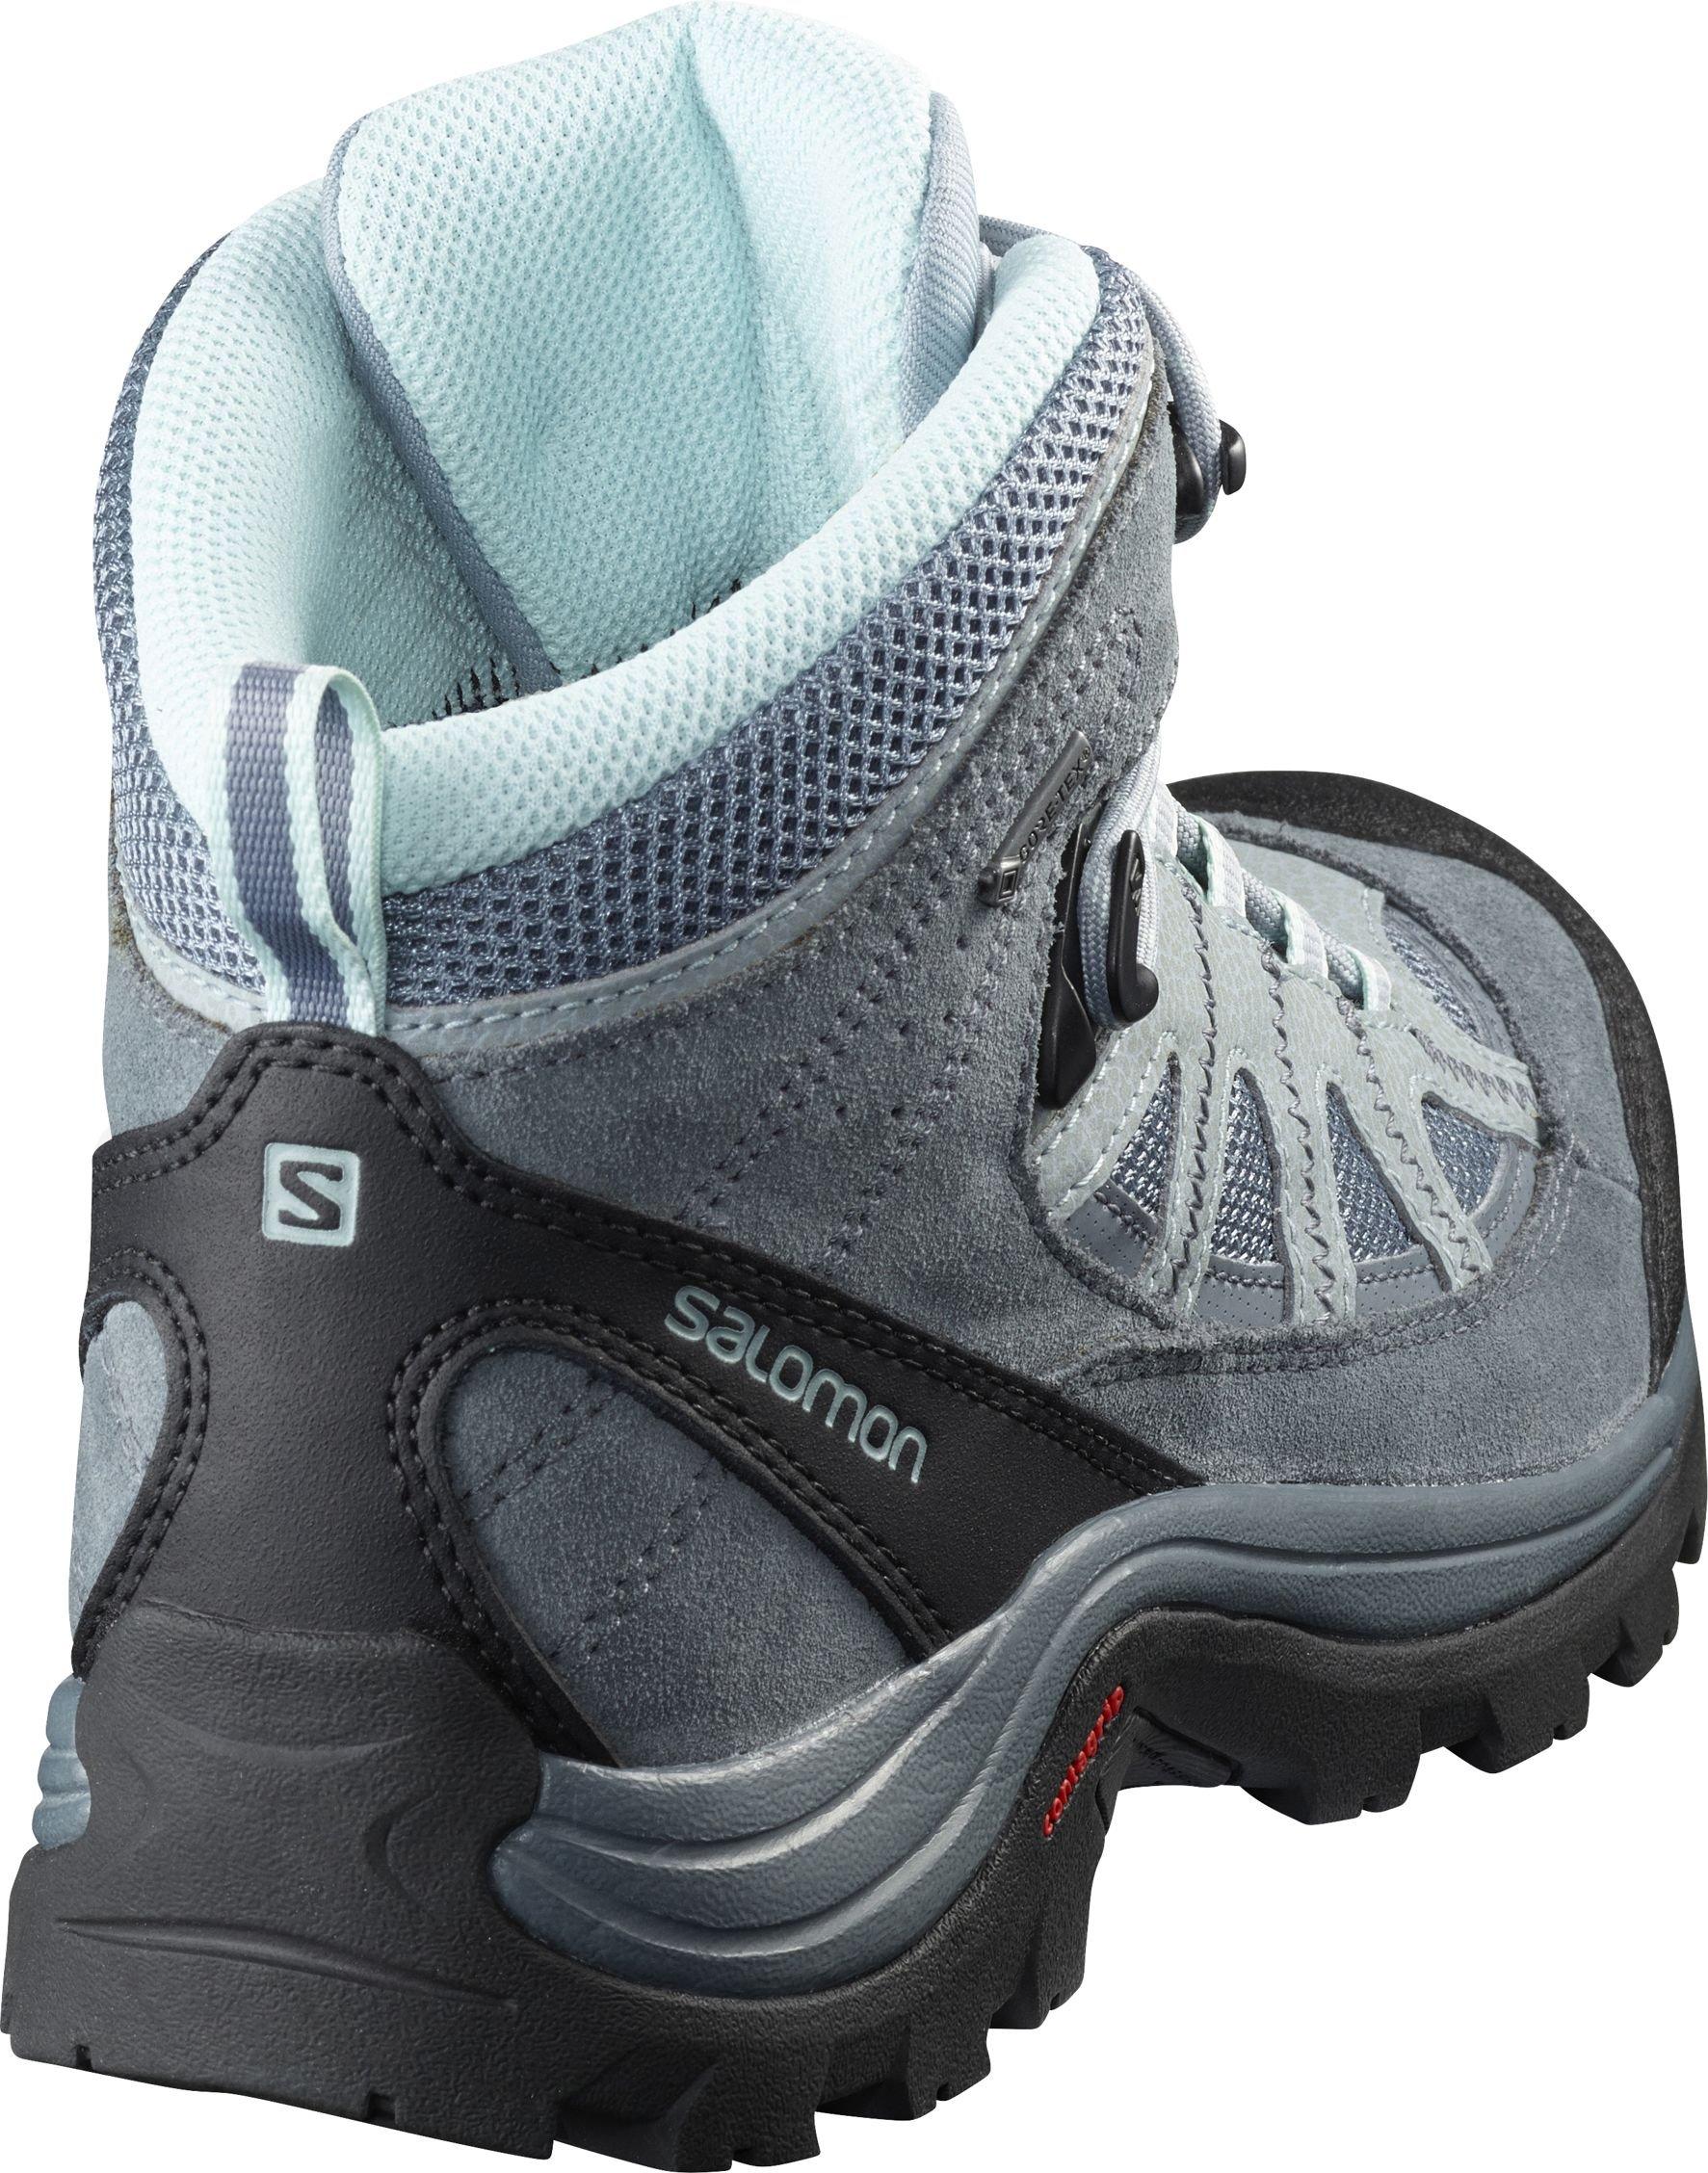 dde683151fc76 Dámská turistická obuv Salomon AUTHENTIC LTR GTX W Le/Stormy Wea/E ...